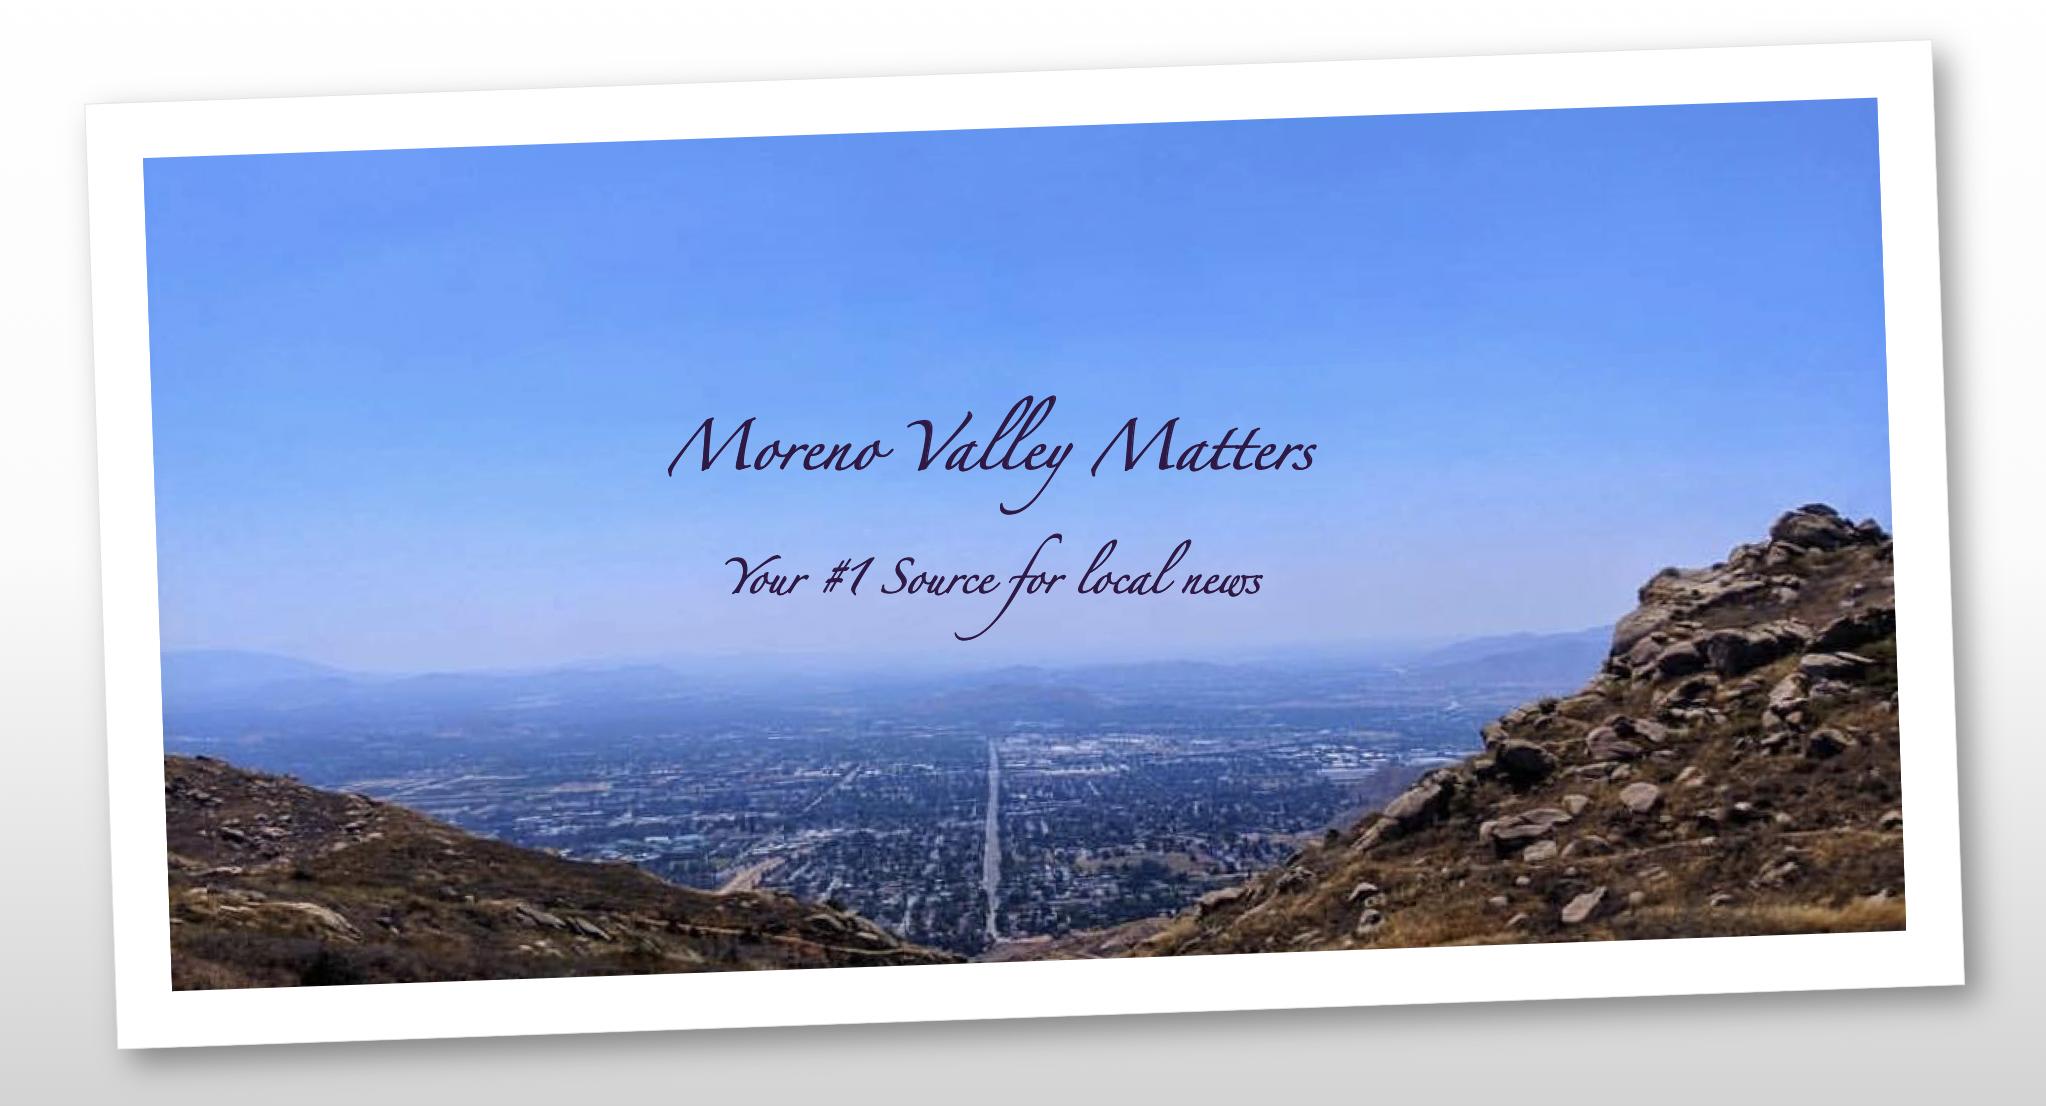 Moreno Valley Matters